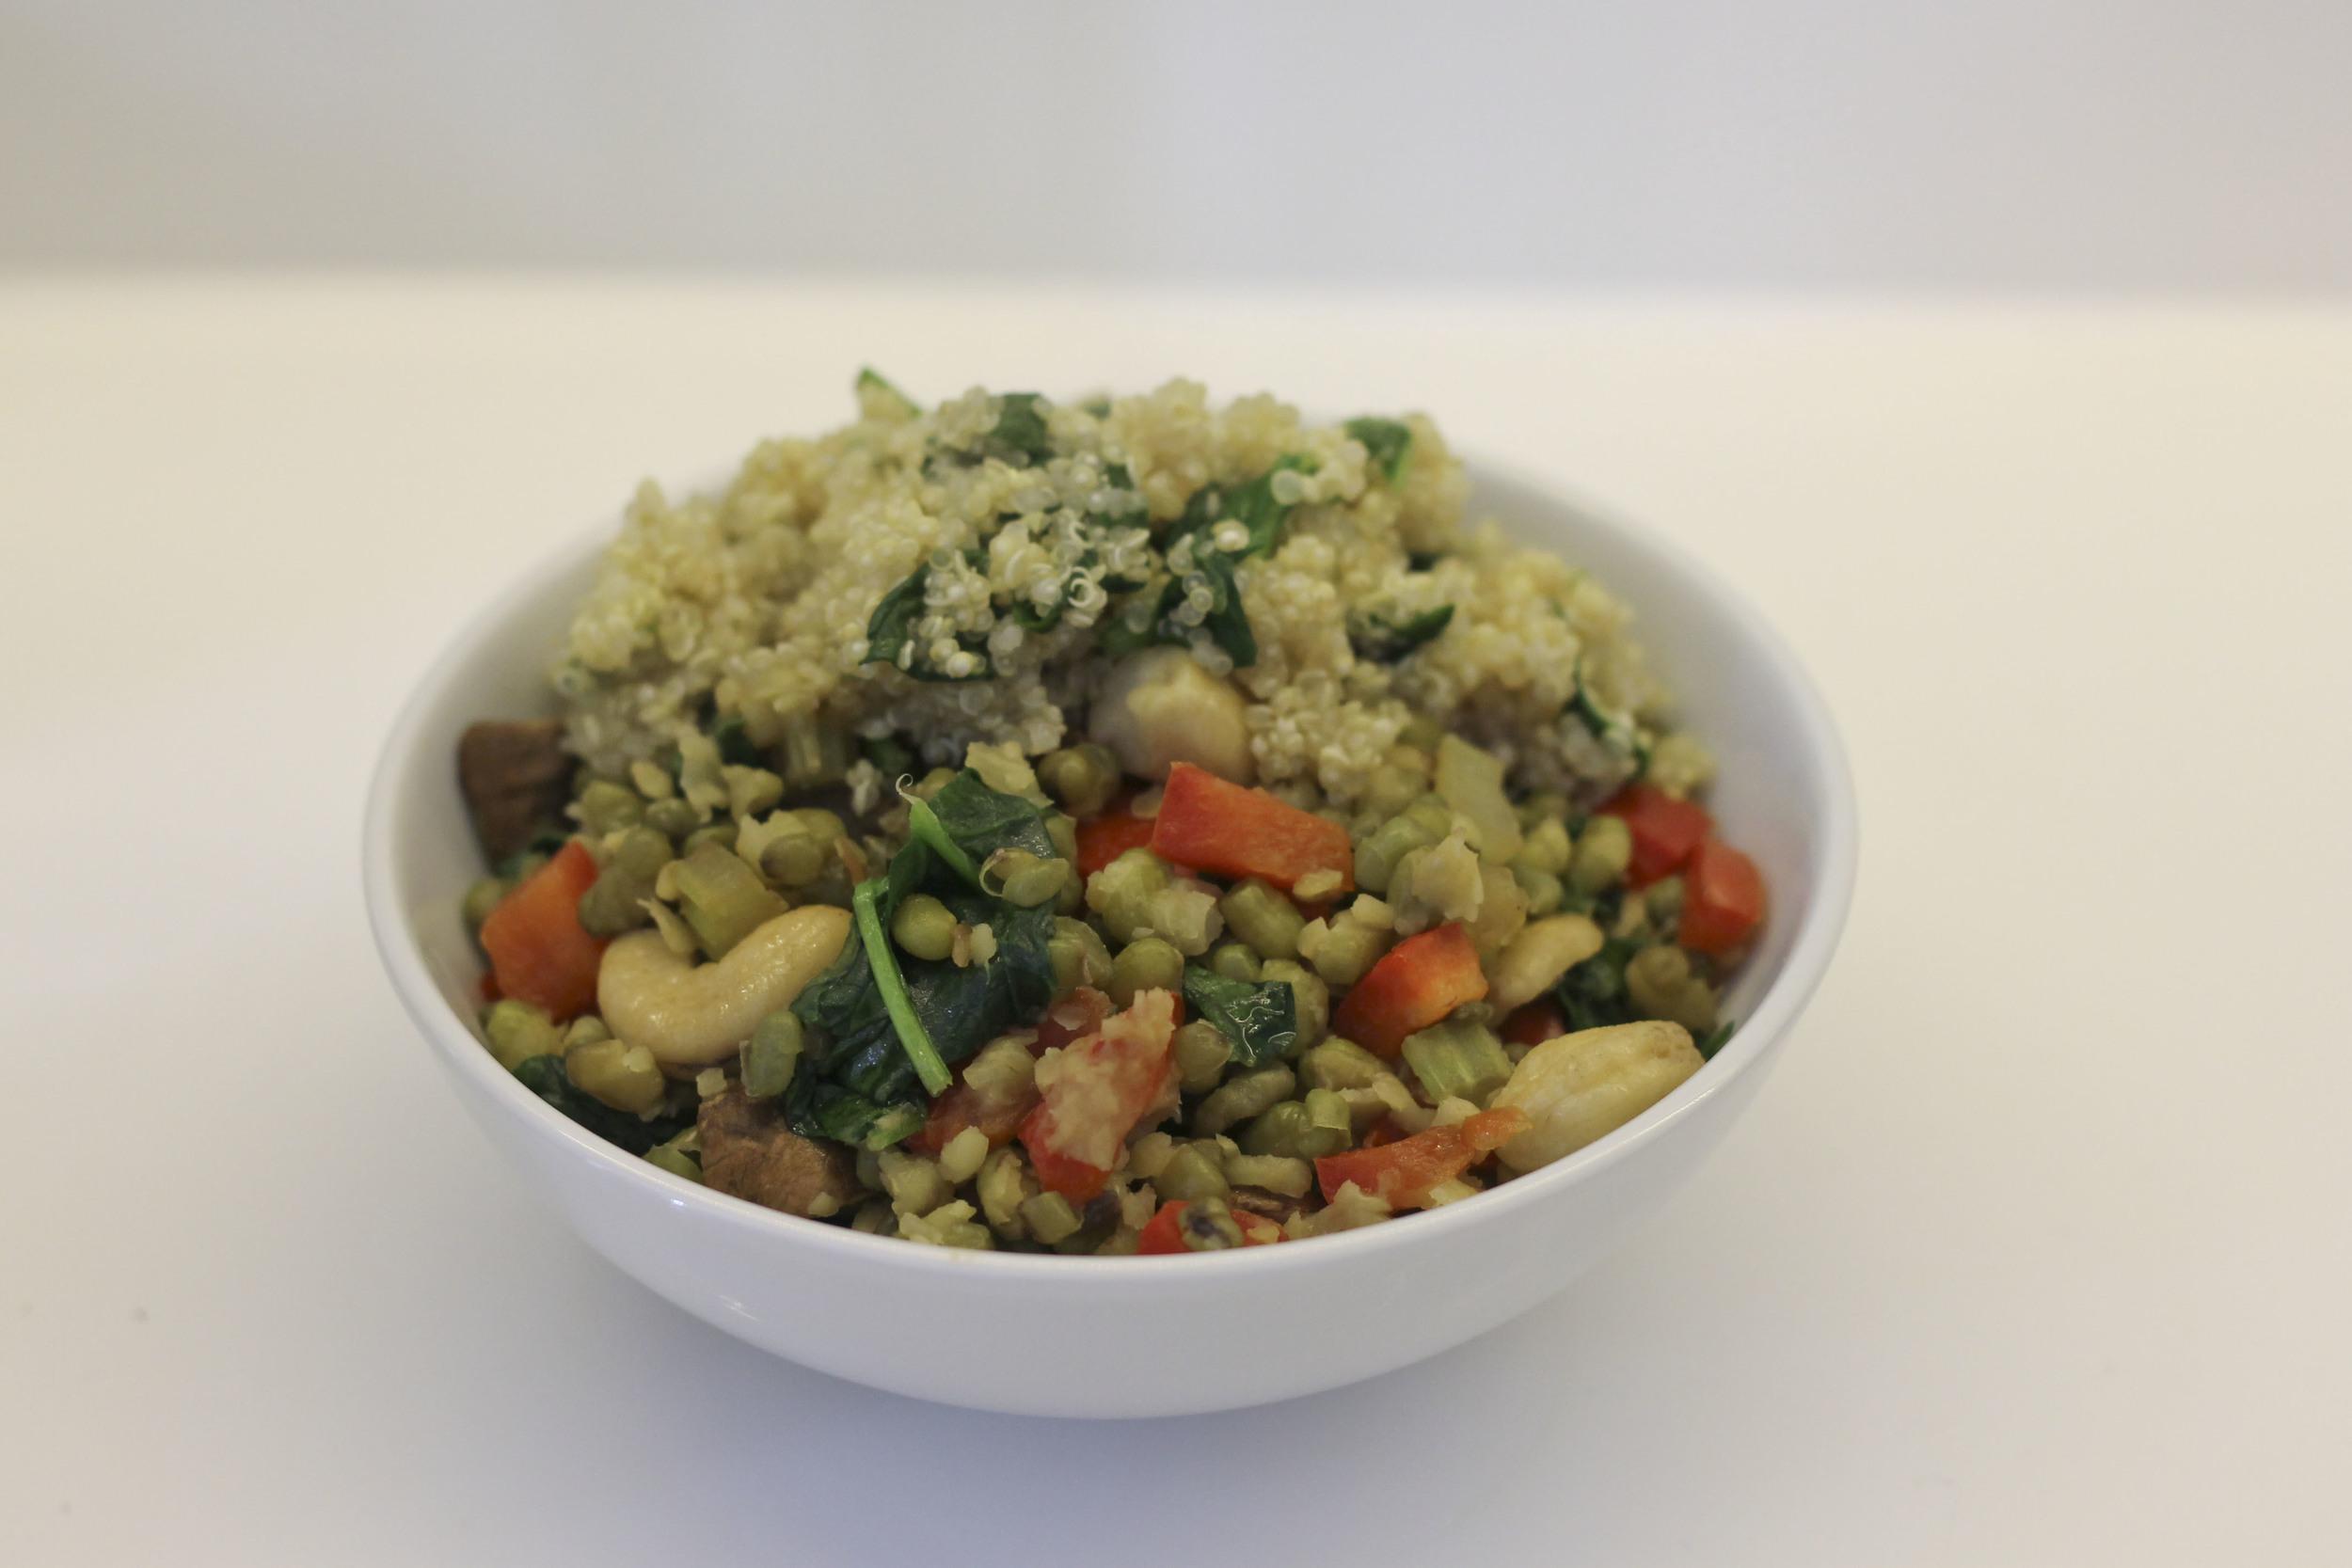 Quinoa and Spinach,Tara Stiles, dein Yoga dein Leben, Rezeptbuch, Yoga Buch, Ratgeber3247.jpg